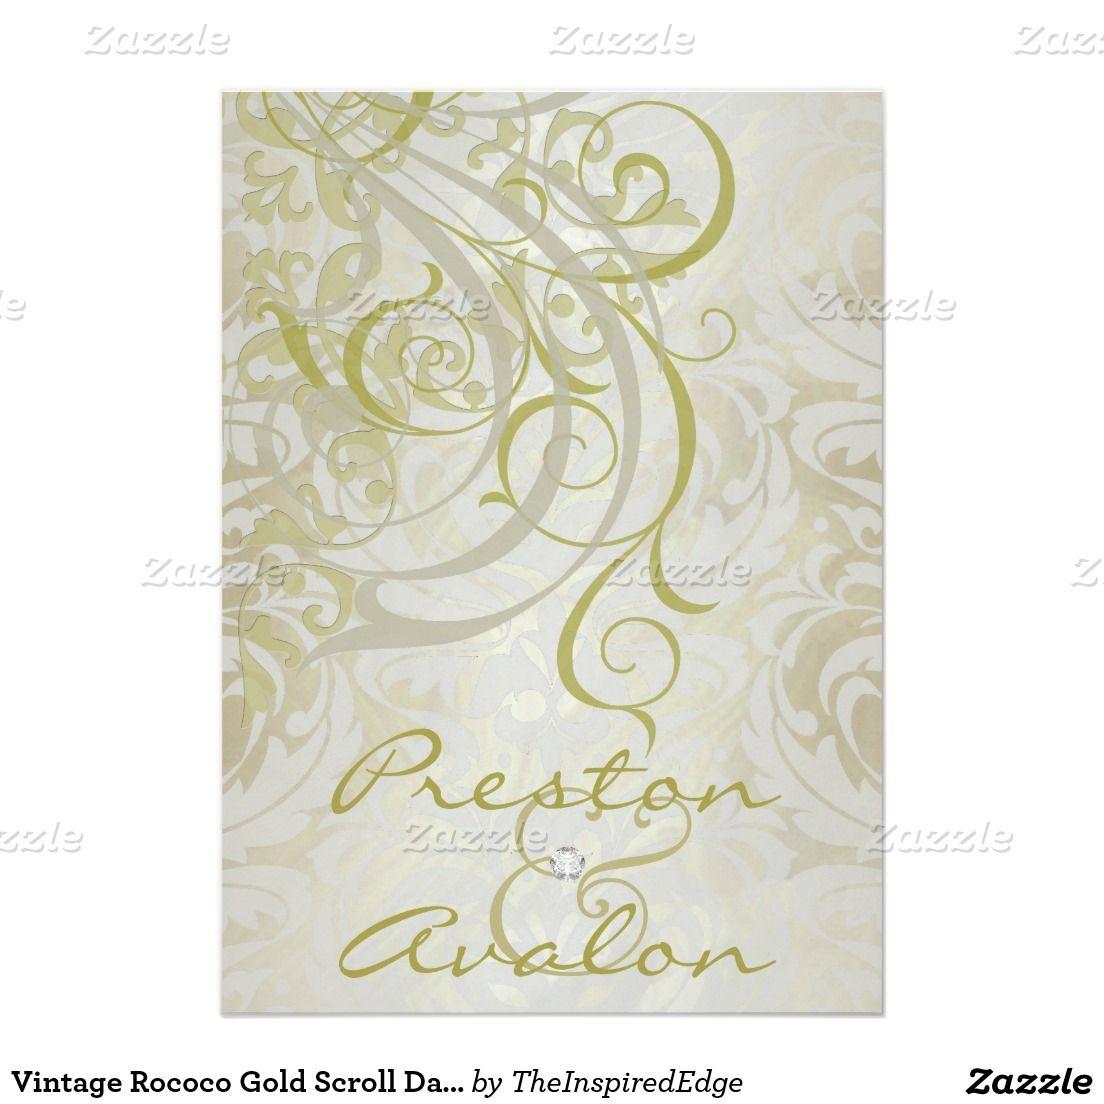 Vintage Rococo Gold Scroll Damask Invitation 5 X 7 Invitation Card Damask Invitations Wedding Themes Winter Vintage Wedding Invitations